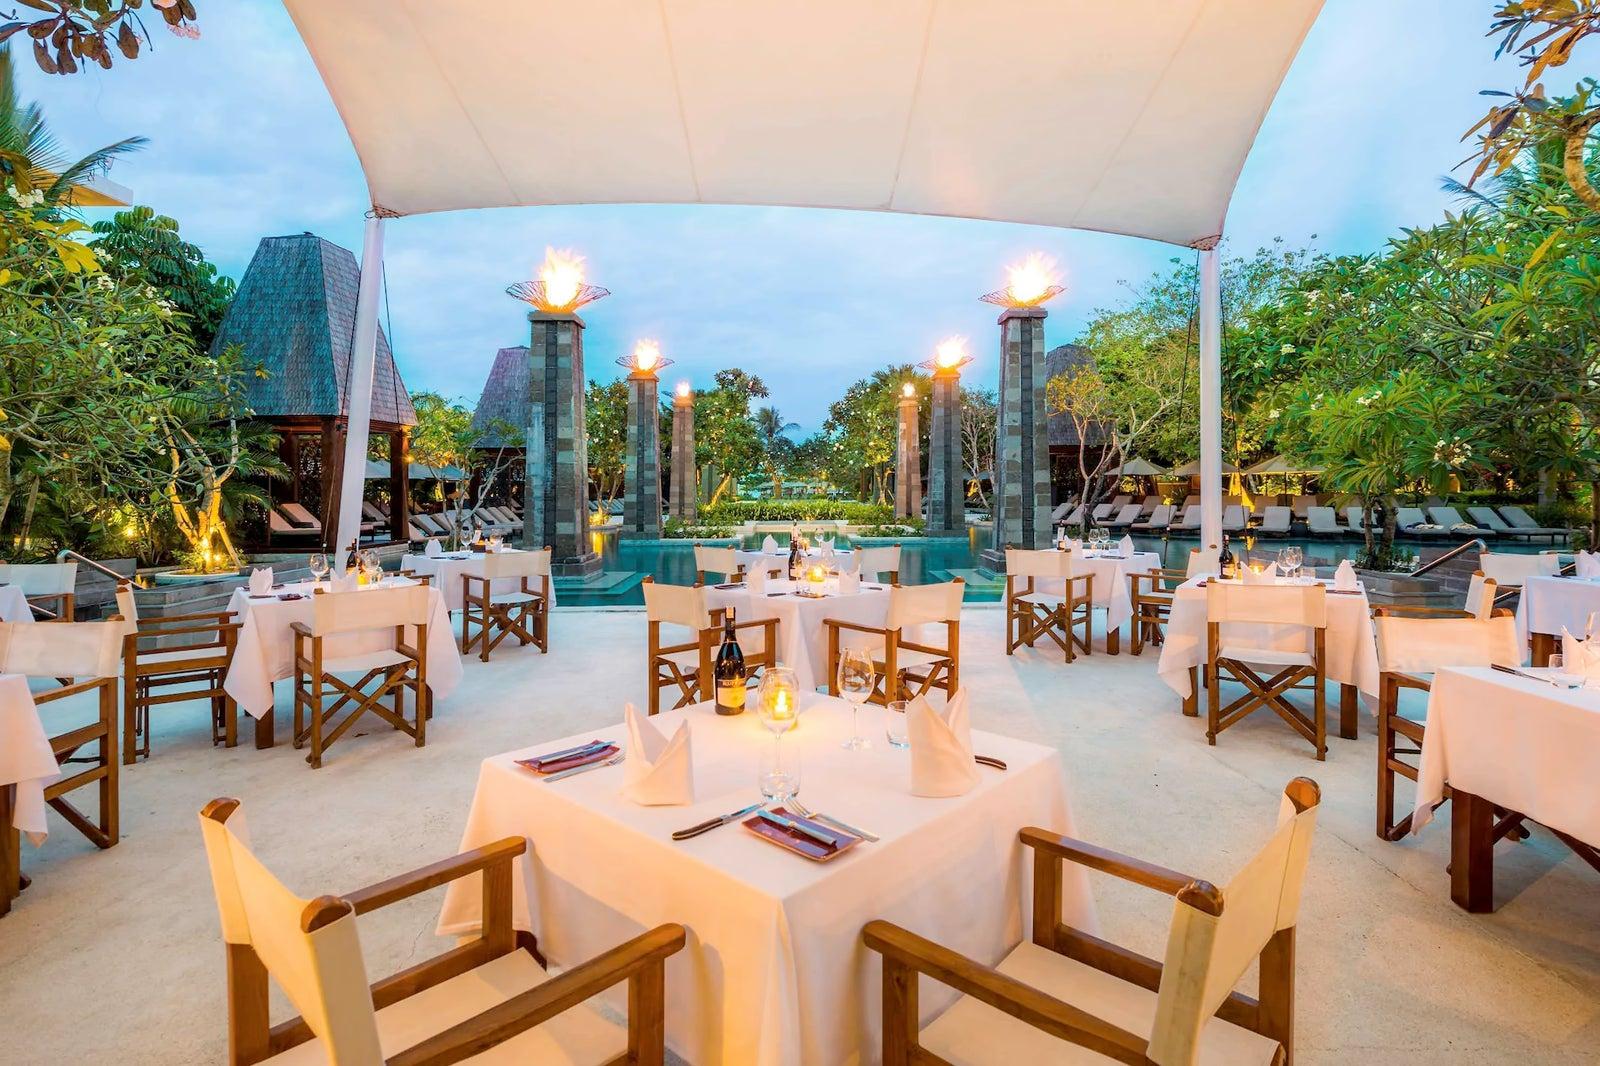 10 Best Restaurants In Nusa Dua Where To Eat In Nusa Dua